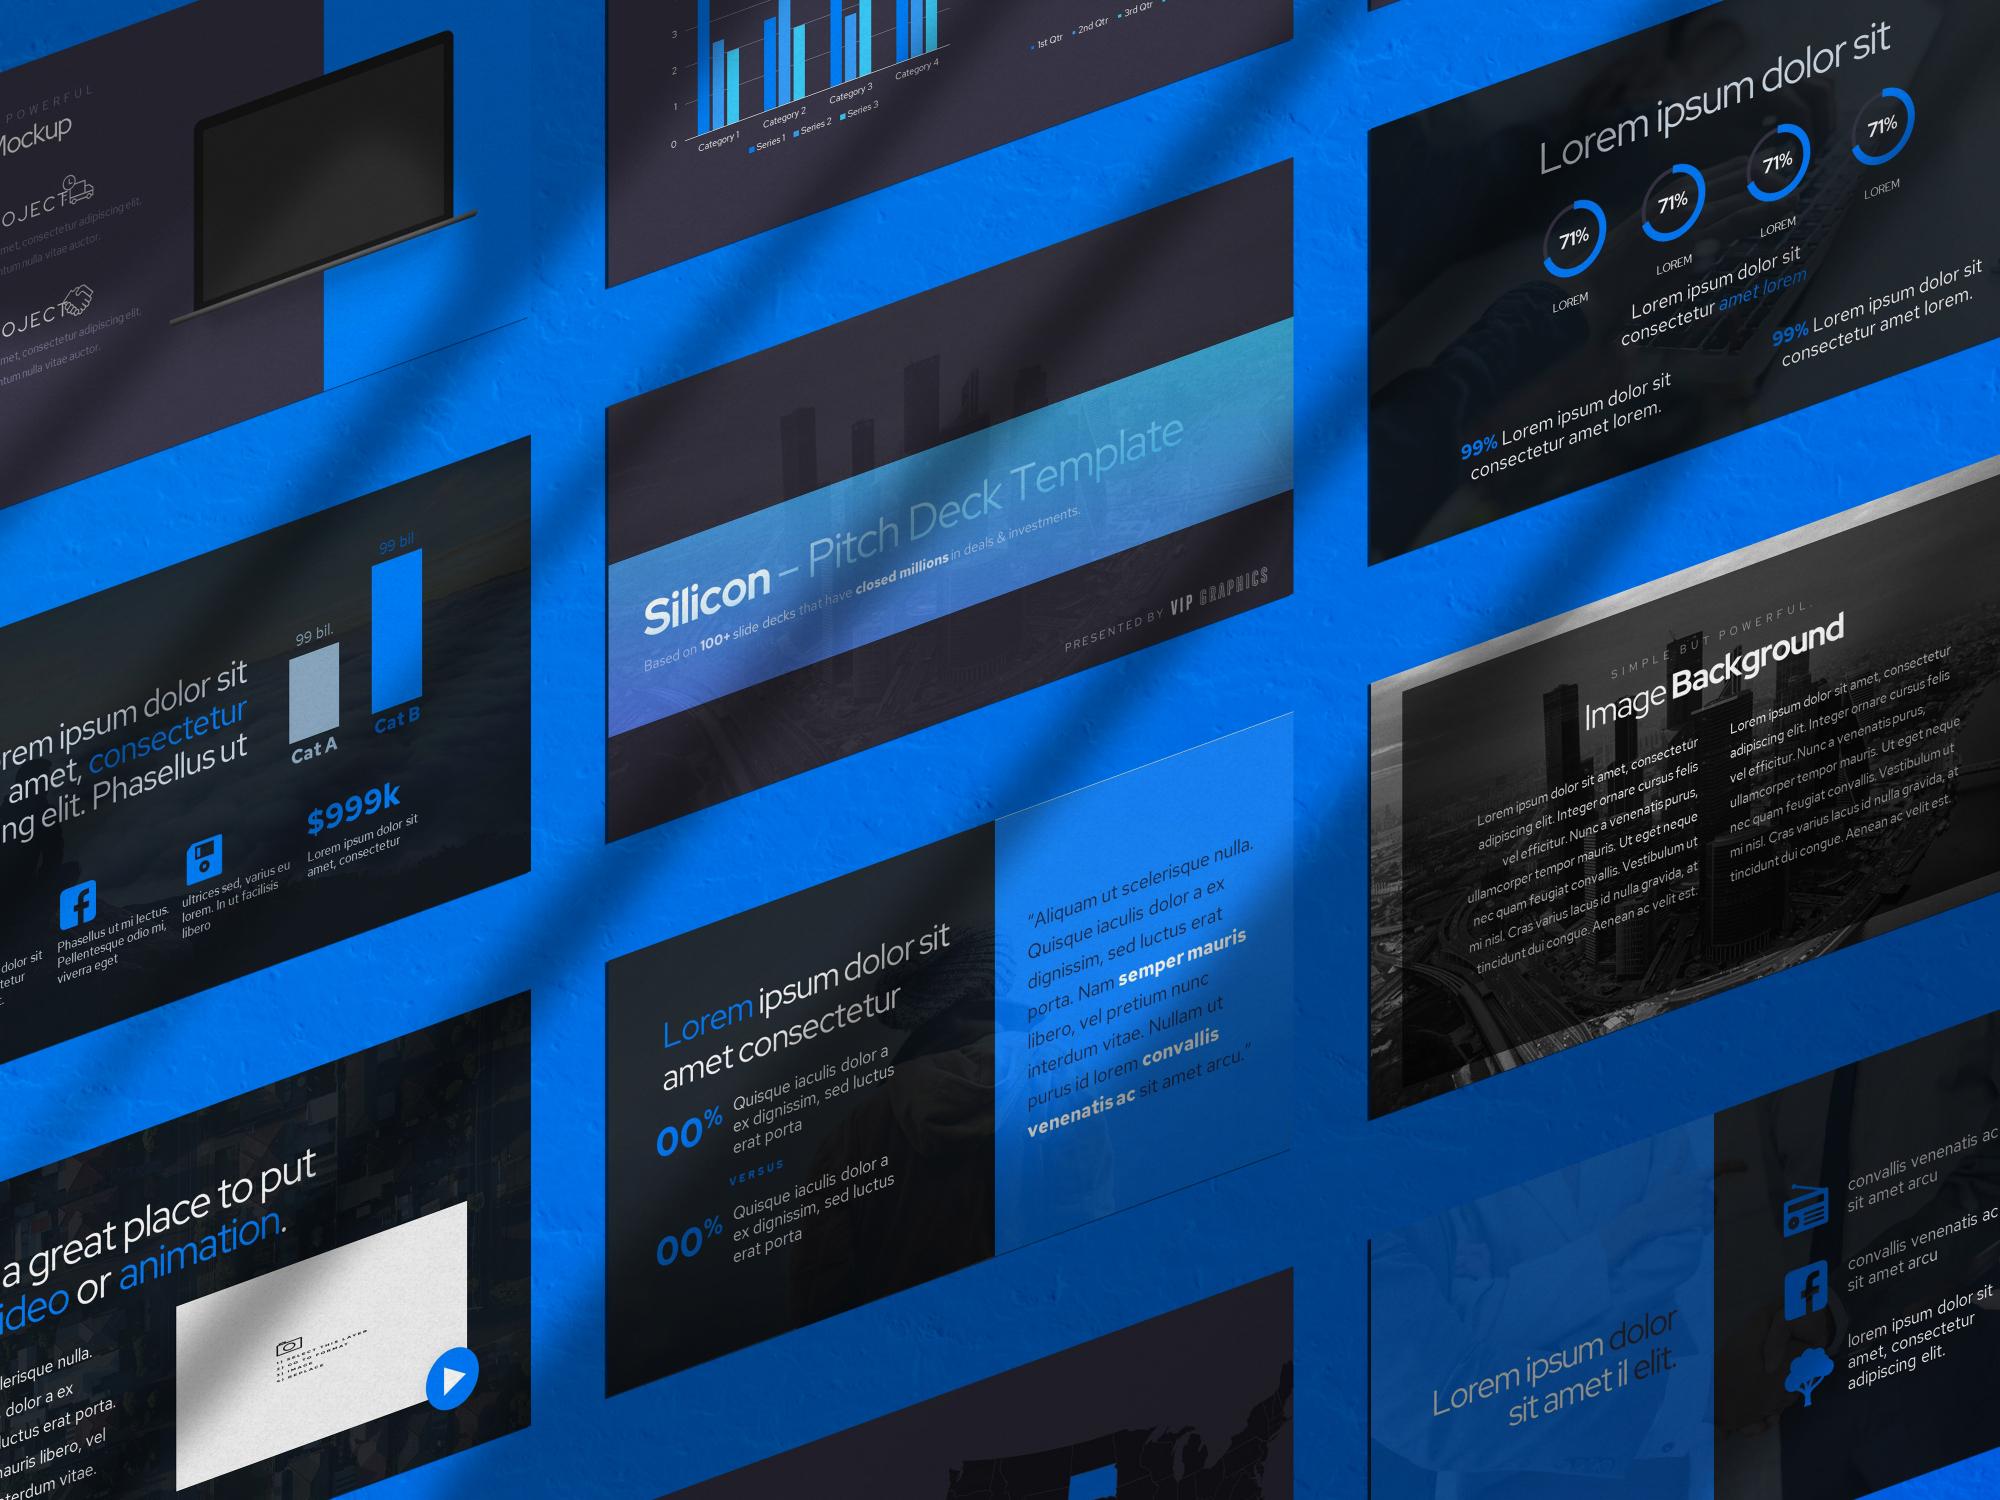 Photorealistic Keynote / Presentation Mockup PSD Template Bundle | VIP.graphics